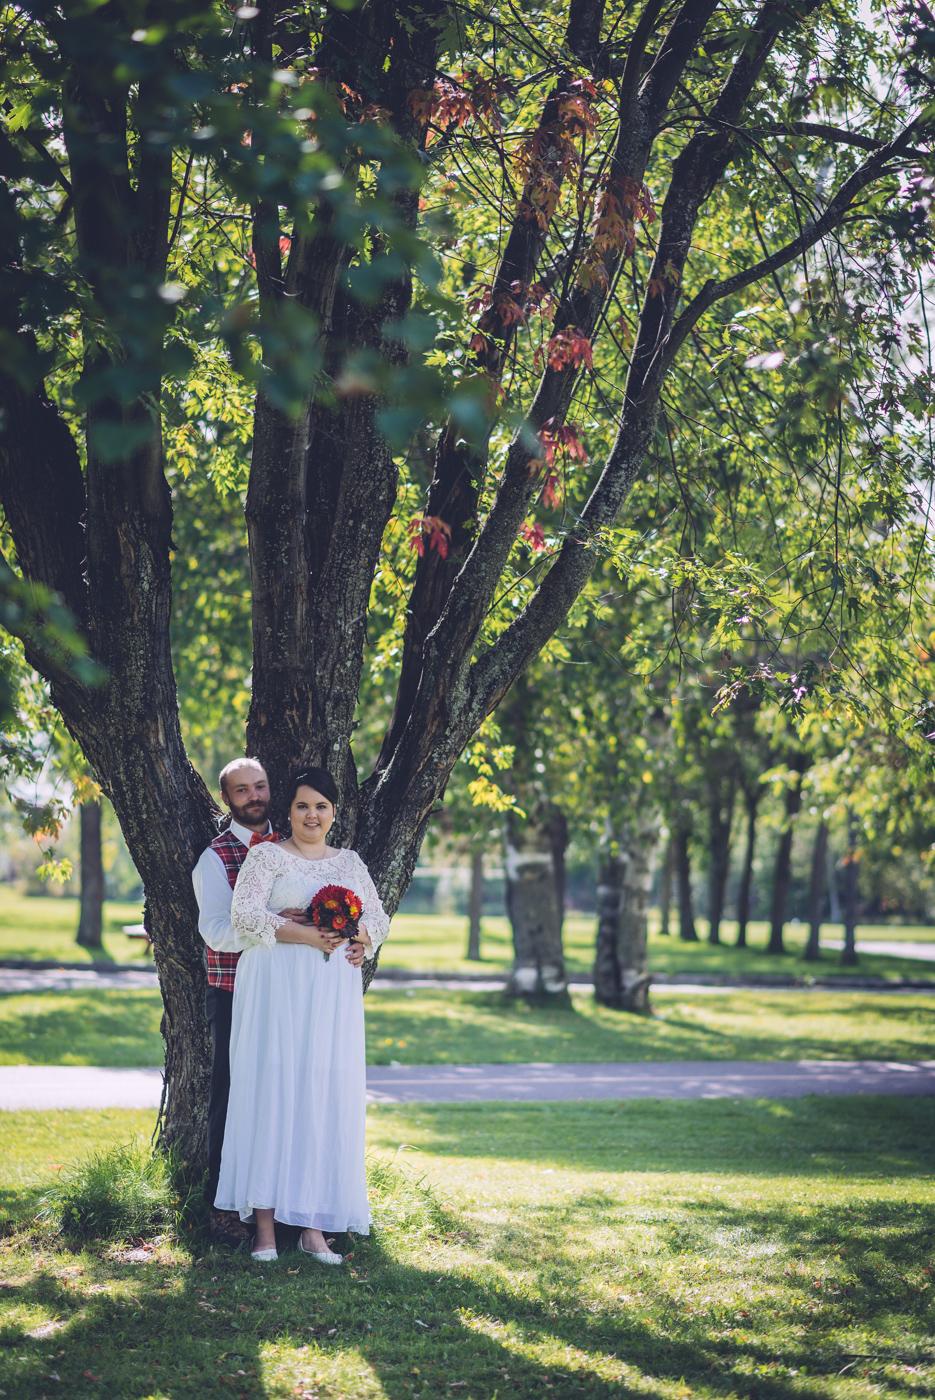 adam_eden_wedding_blog50.jpg